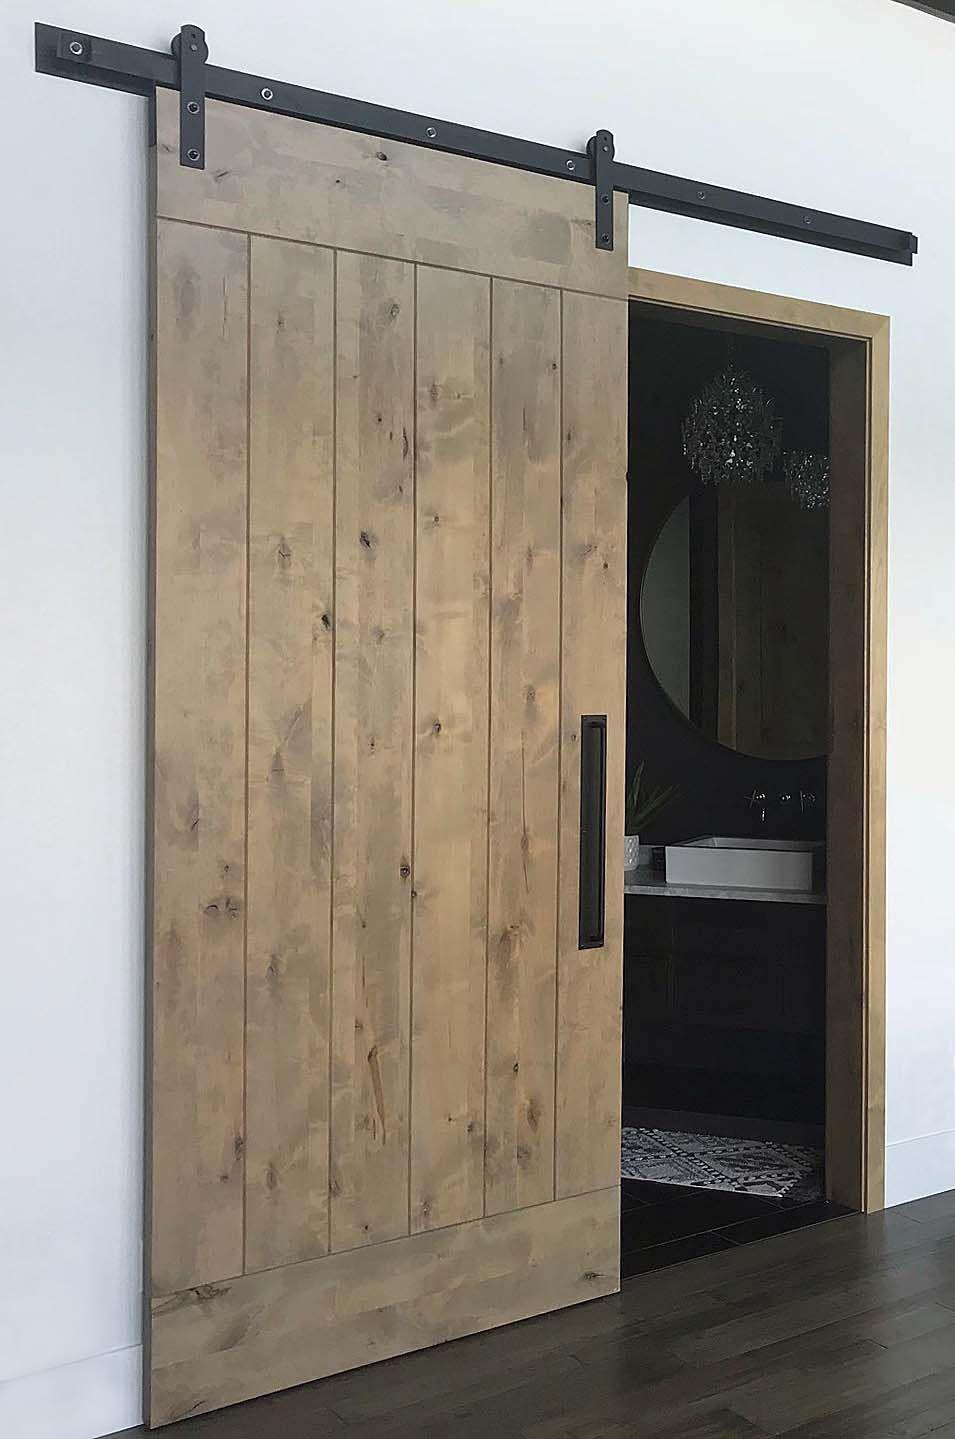 Handsome Plank Style Barn Door In Knotty Alder Stained With Minwax Weathered Oak Rustica Hardware Finis Weathered Oak Stain Stained Doors Knotty Alder Doors